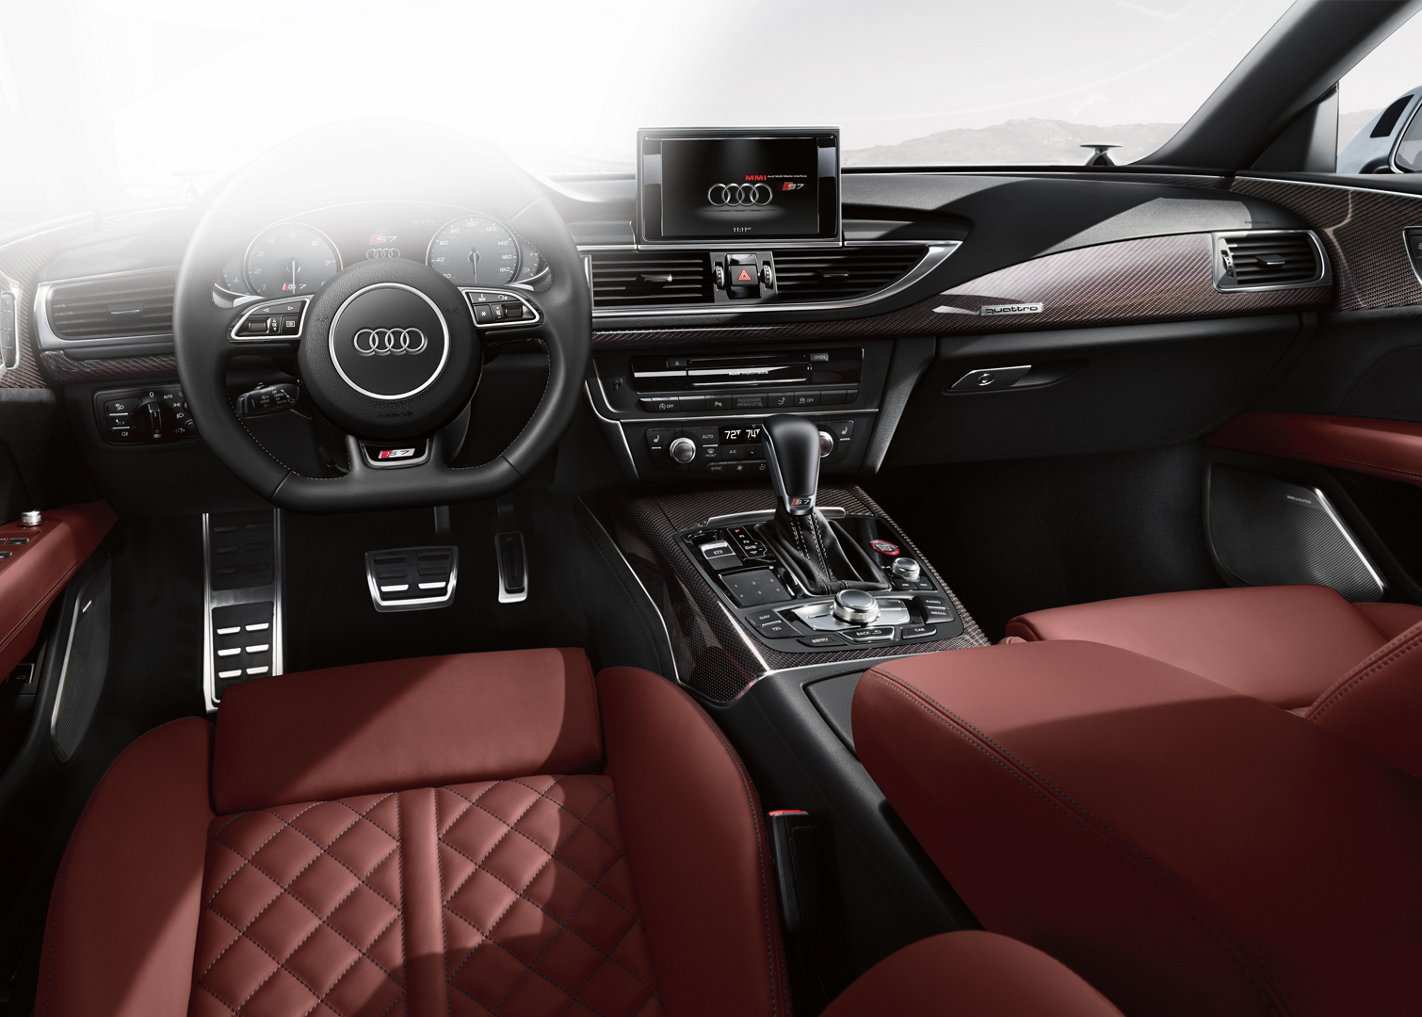 New Audi S7 Interior main image